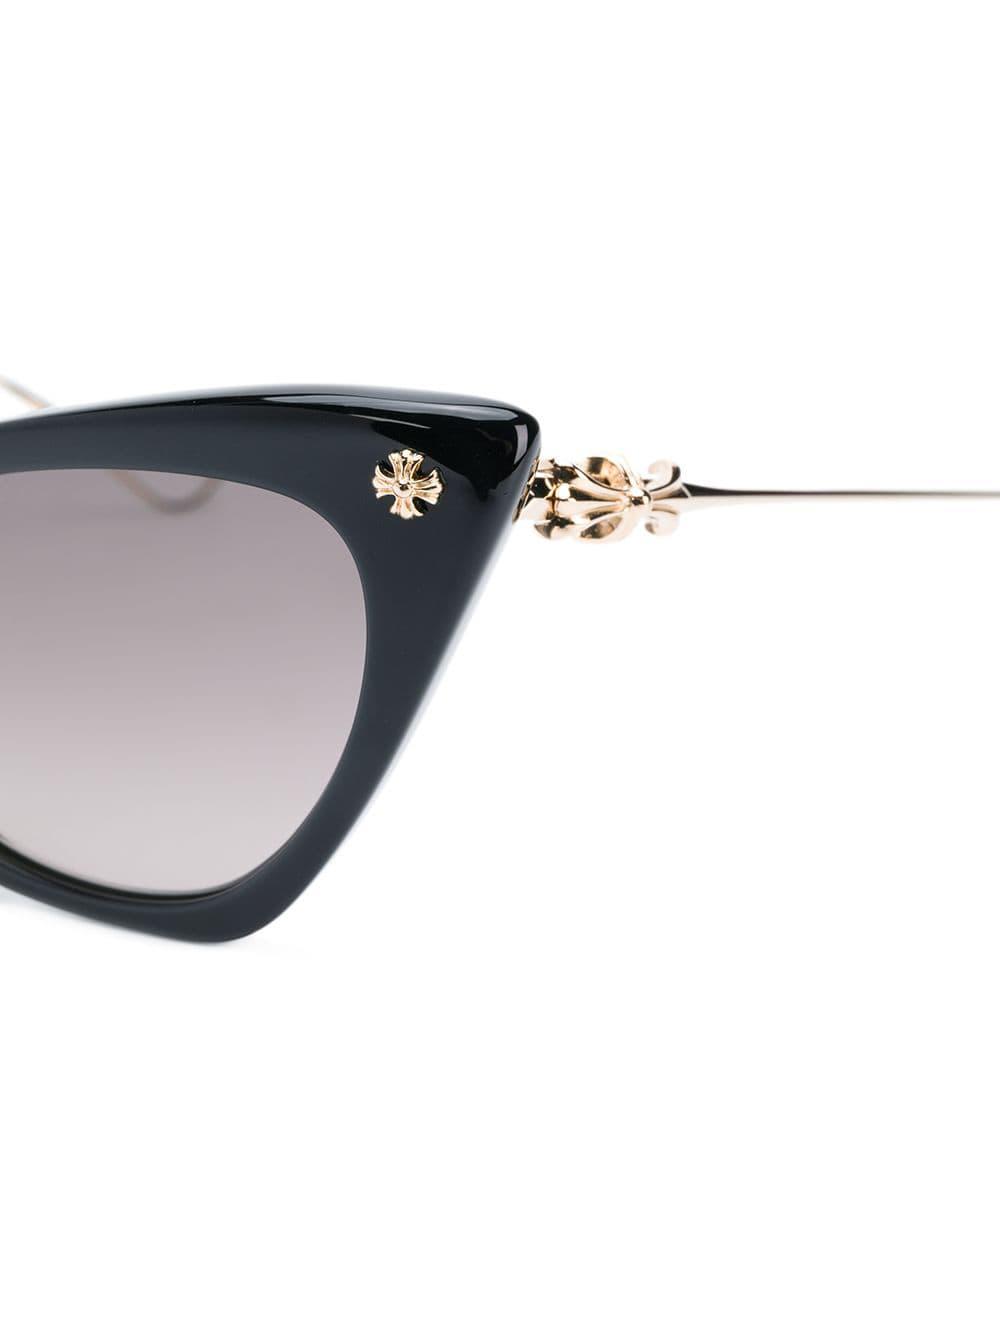 228d0b7c071 Chrome Hearts Bailey Girl Sunglasses in Black - Lyst